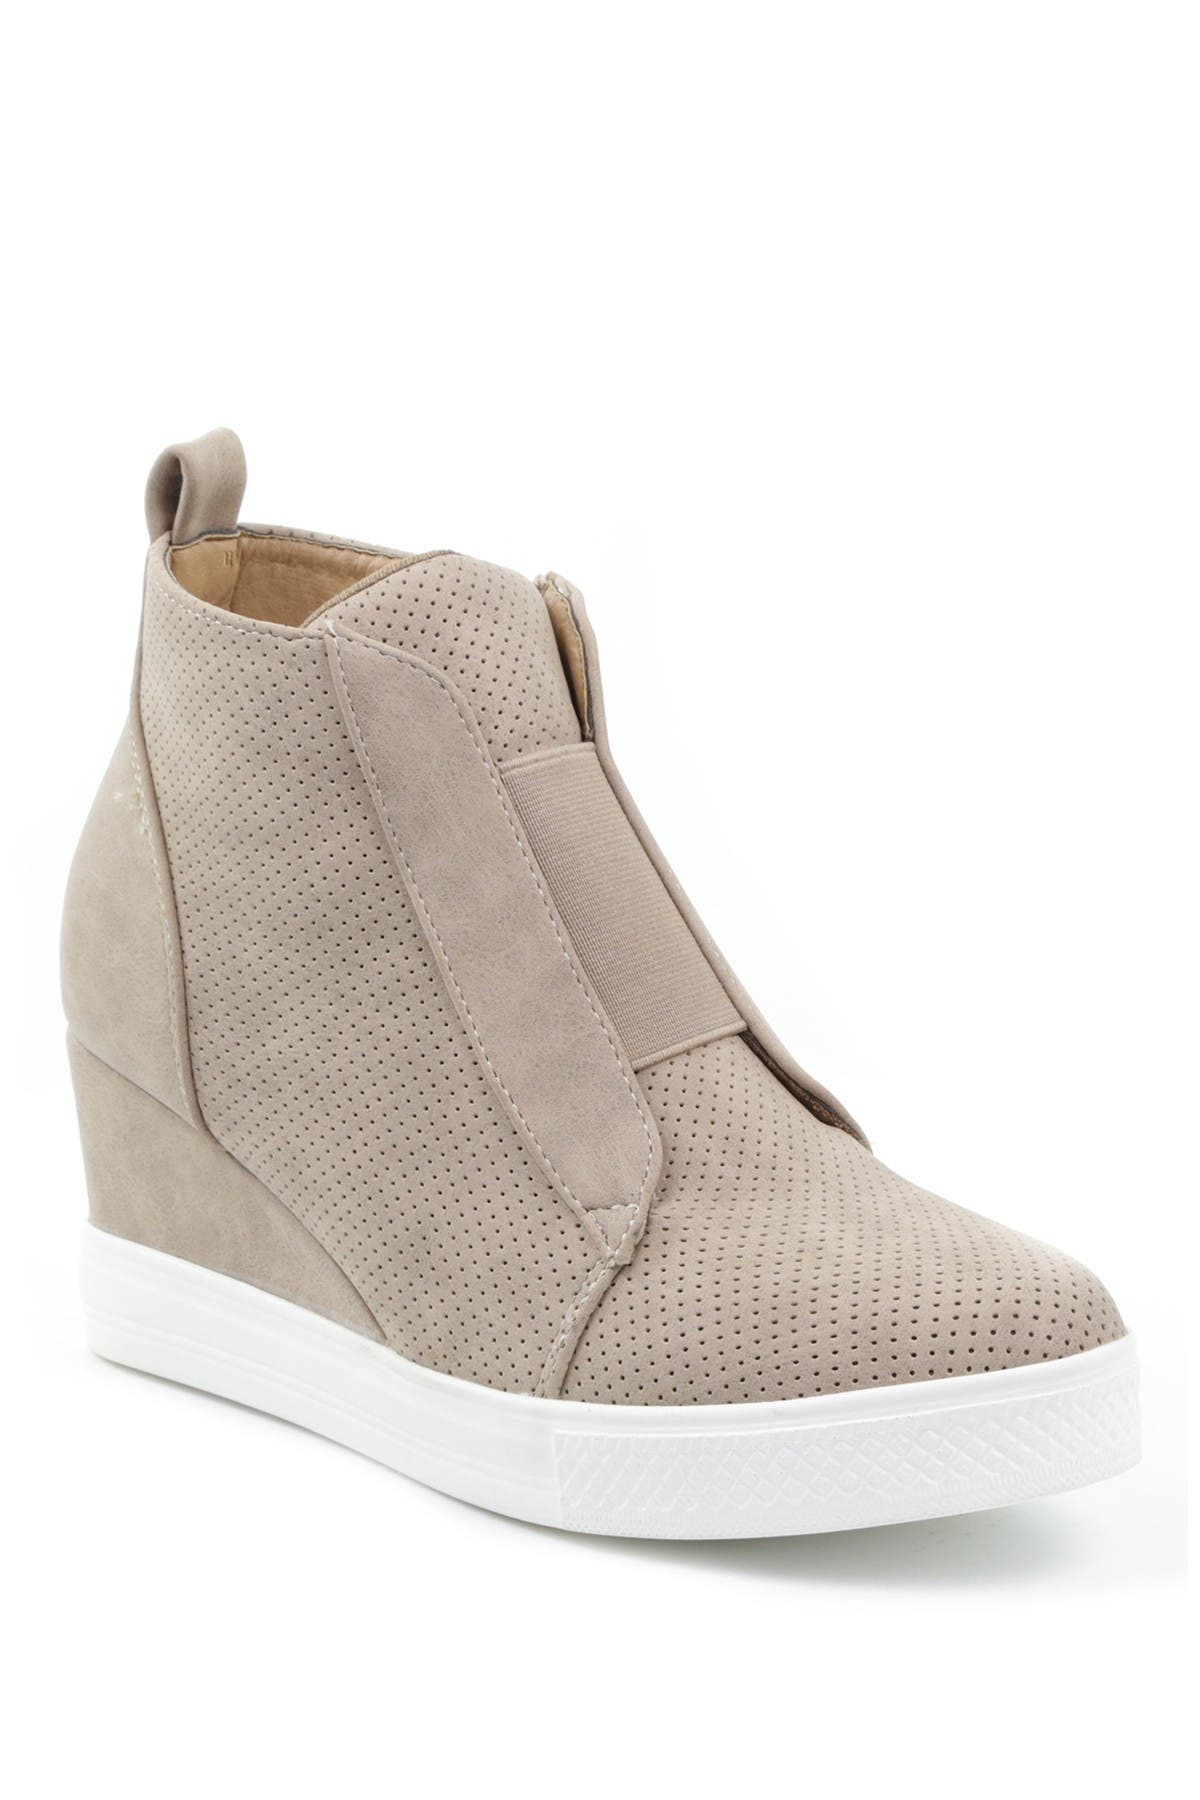 Image of Catherine Malandrino Sabra Perforated Wedge Sneaker